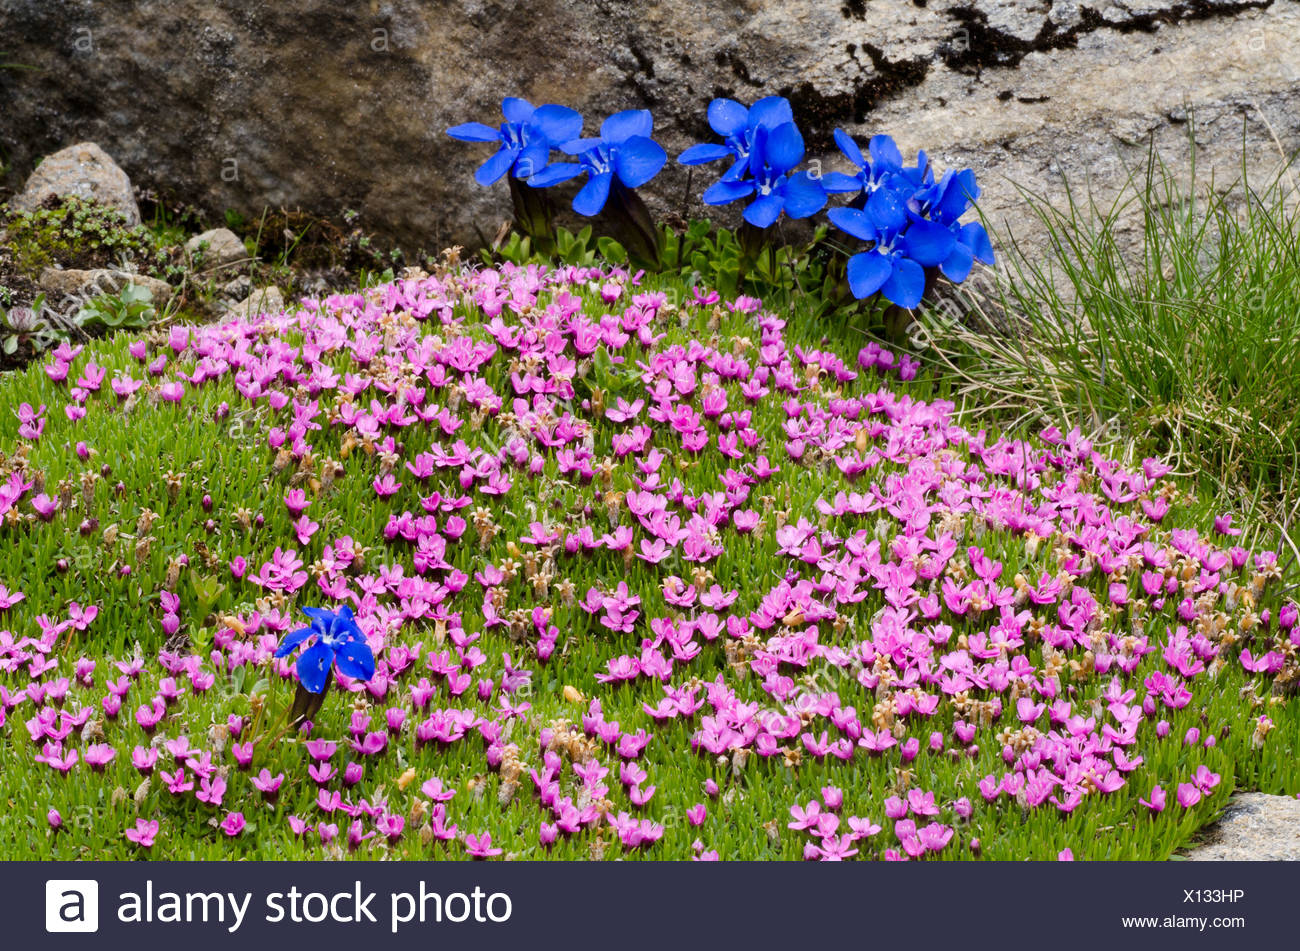 Moss Campion or Cushion Pink (Silene acaulis), Gamsgrube, Hohe Tauern National Park, Carinthia, Austria, Europe - Stock Image